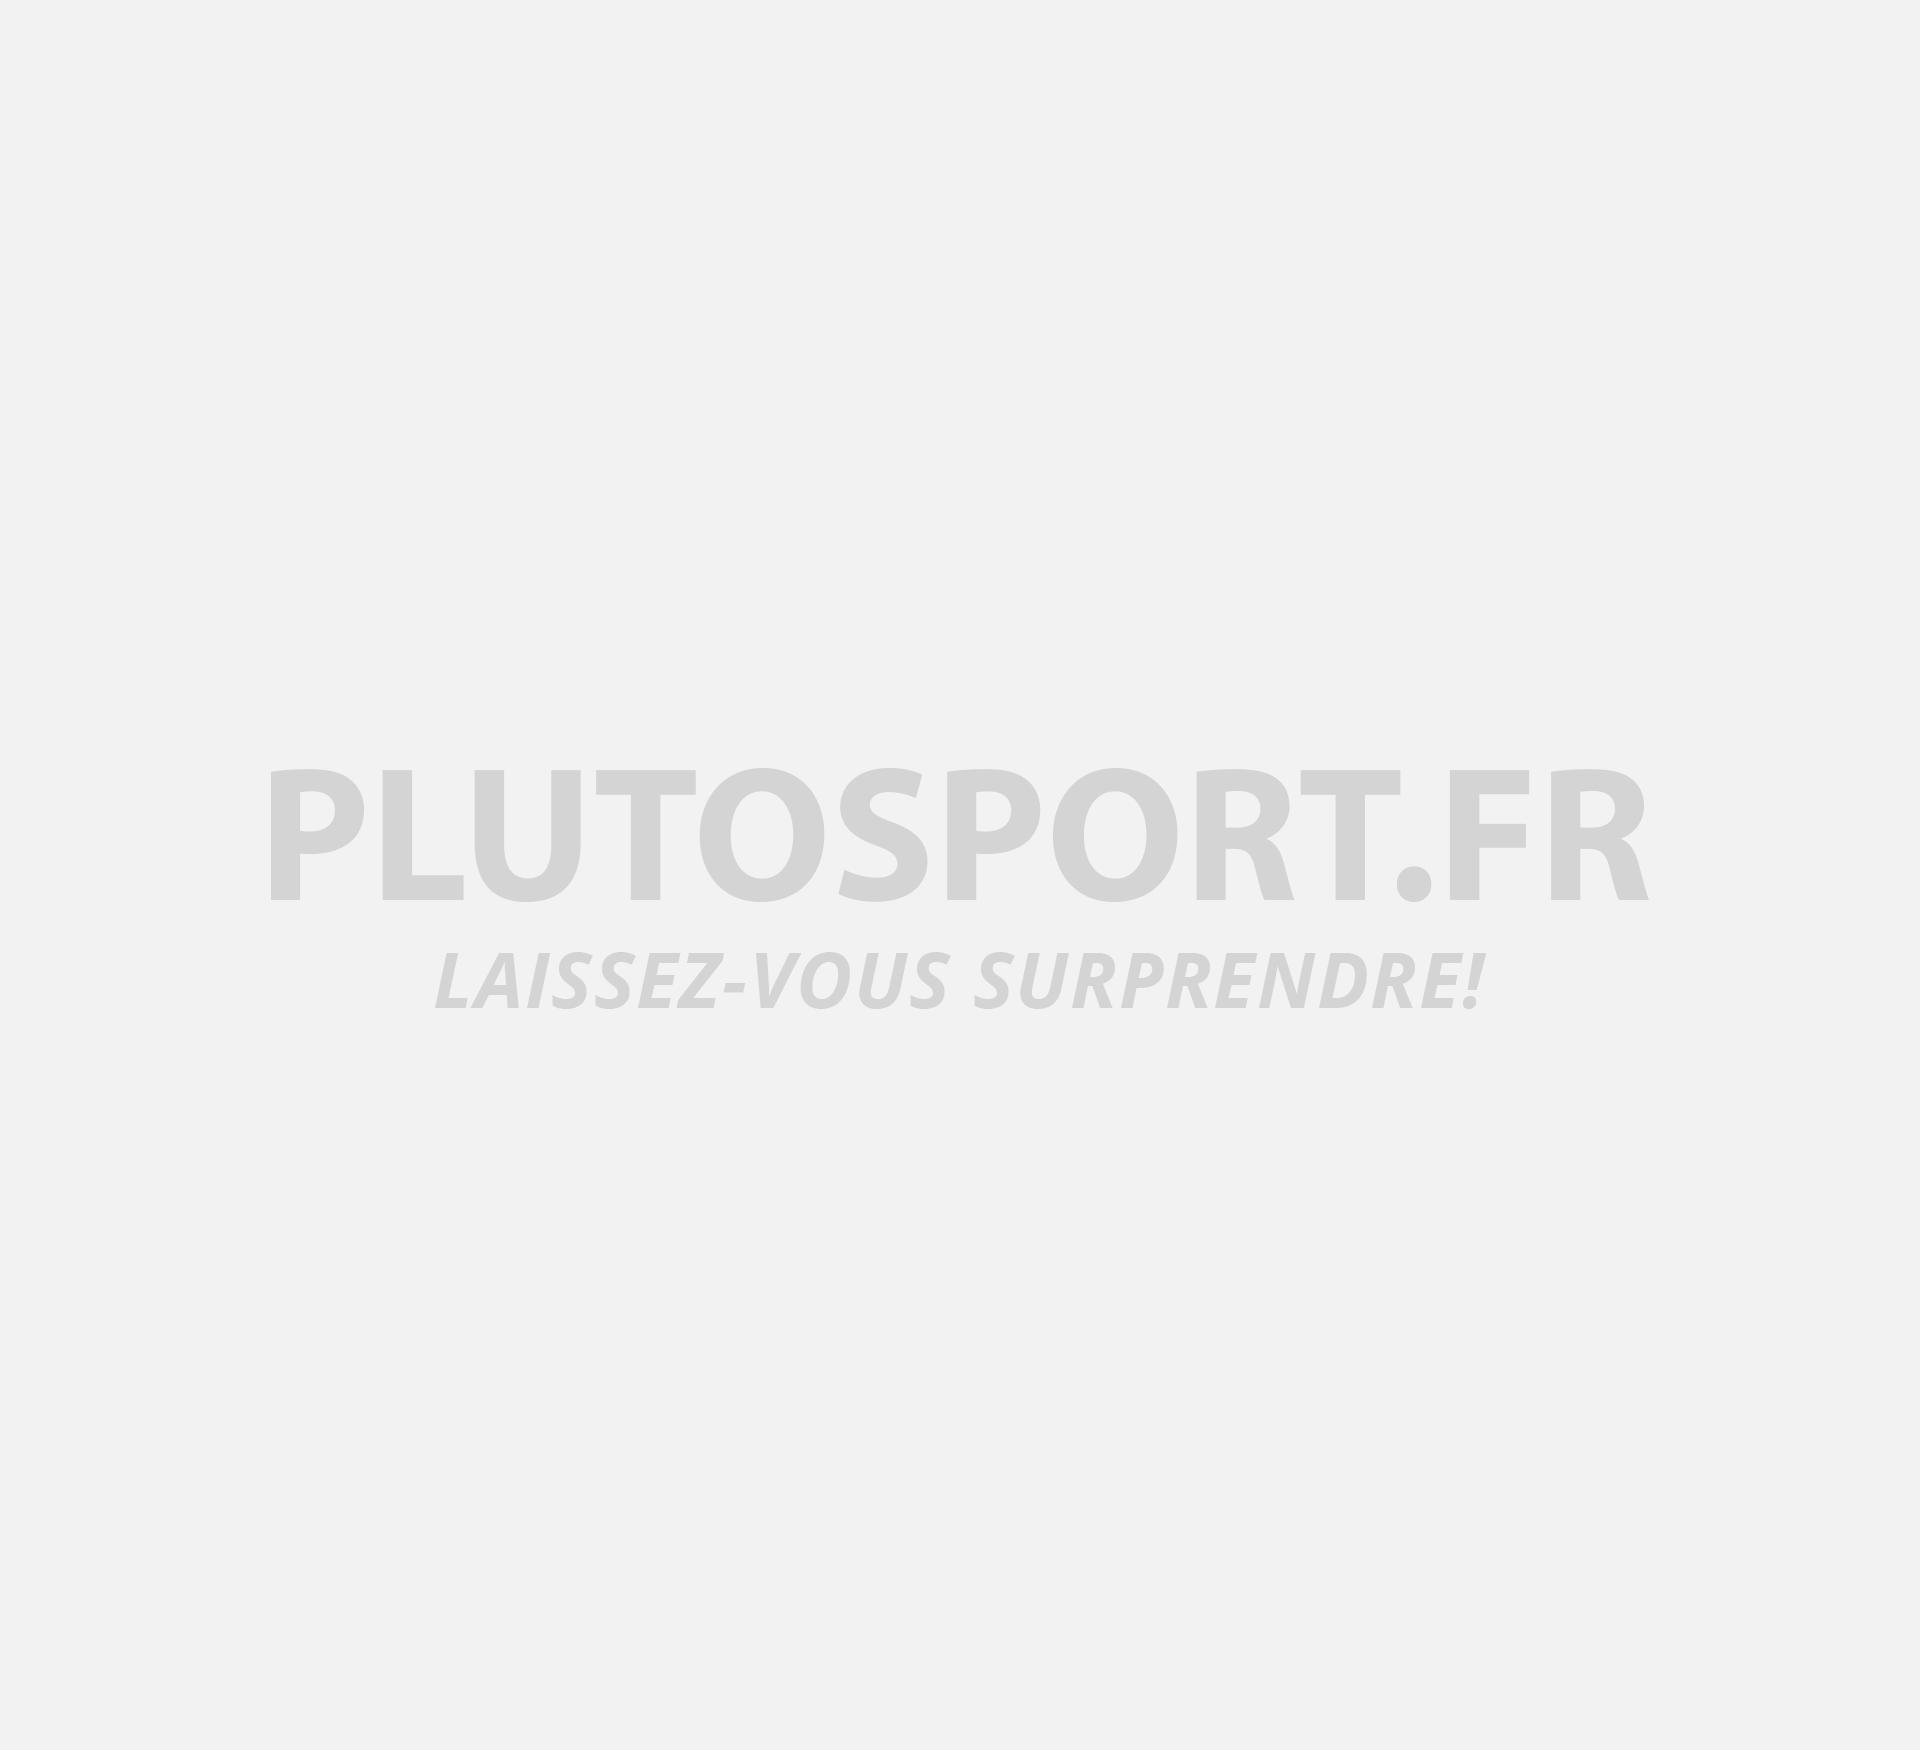 Hommes Dri Short Strike Fc Shorts Barcelona Clubs Zwptoulkix Fit Nike 0wPX8nOk